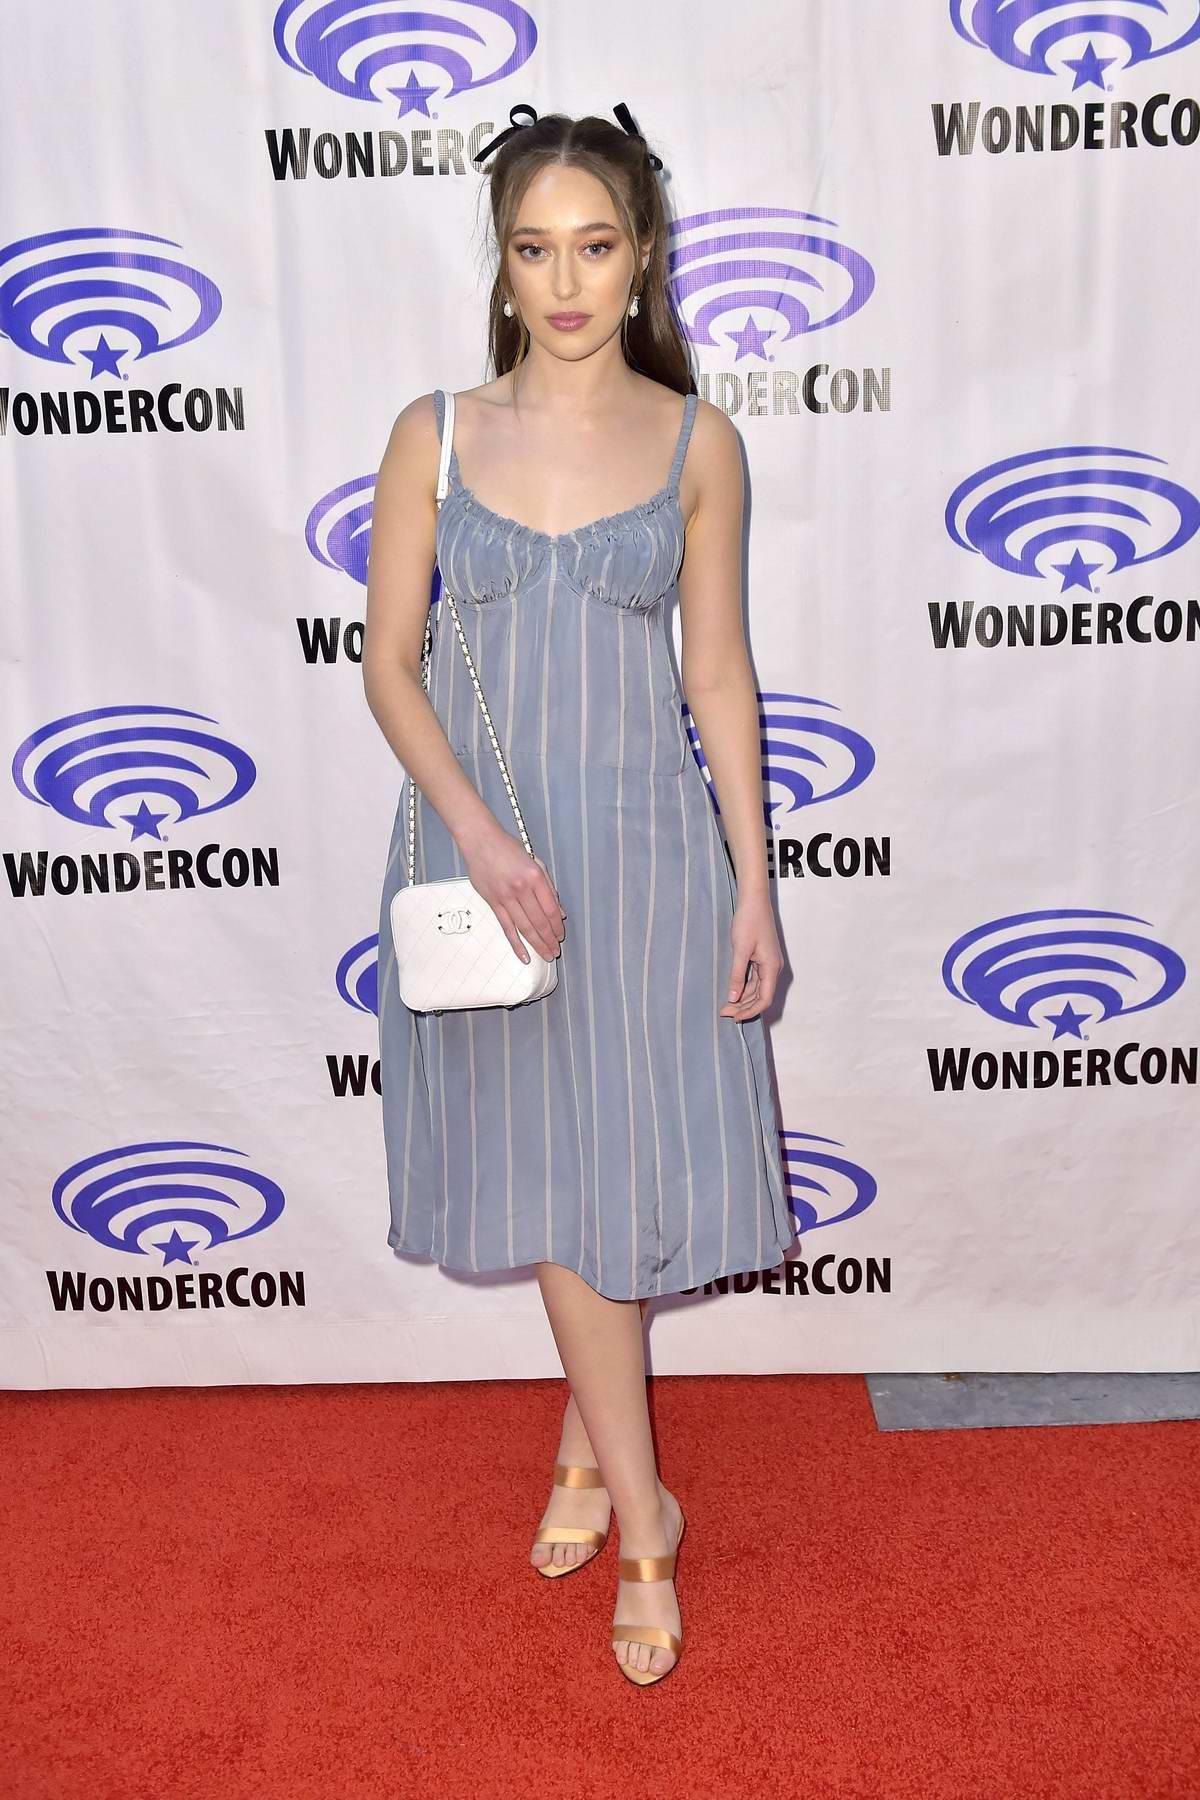 Alycia Debnam-Carey attends 'Fear The Walking Dead' Panel at WonderCon 2019 in Anaheim, California